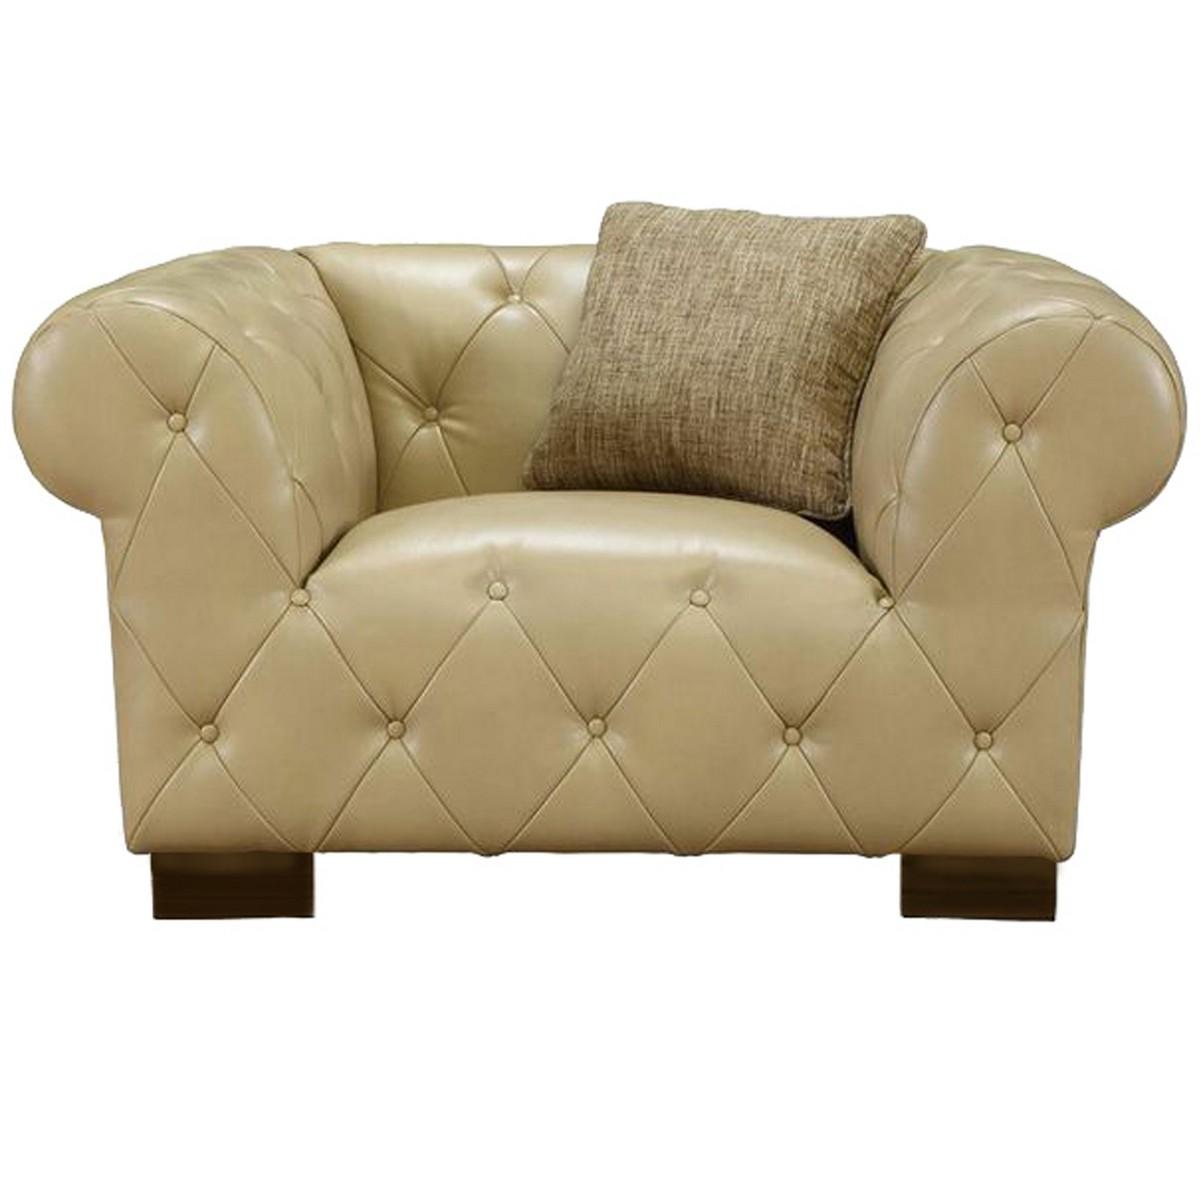 Armen Living Tuxedo Beige Chair In Bonded Leather